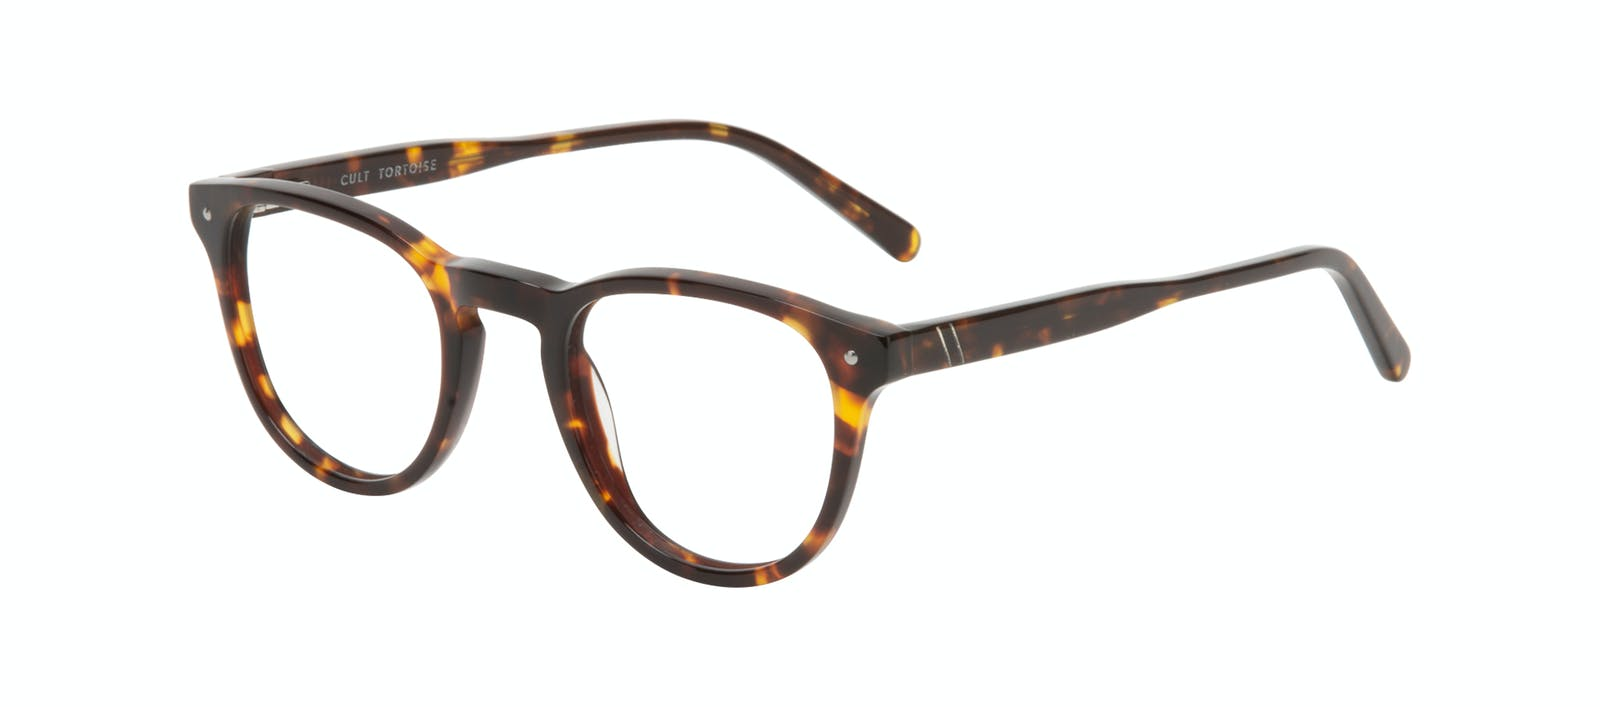 580ee189b6 Affordable Fashion Glasses Round Eyeglasses Men Cult Tortoise Tilt